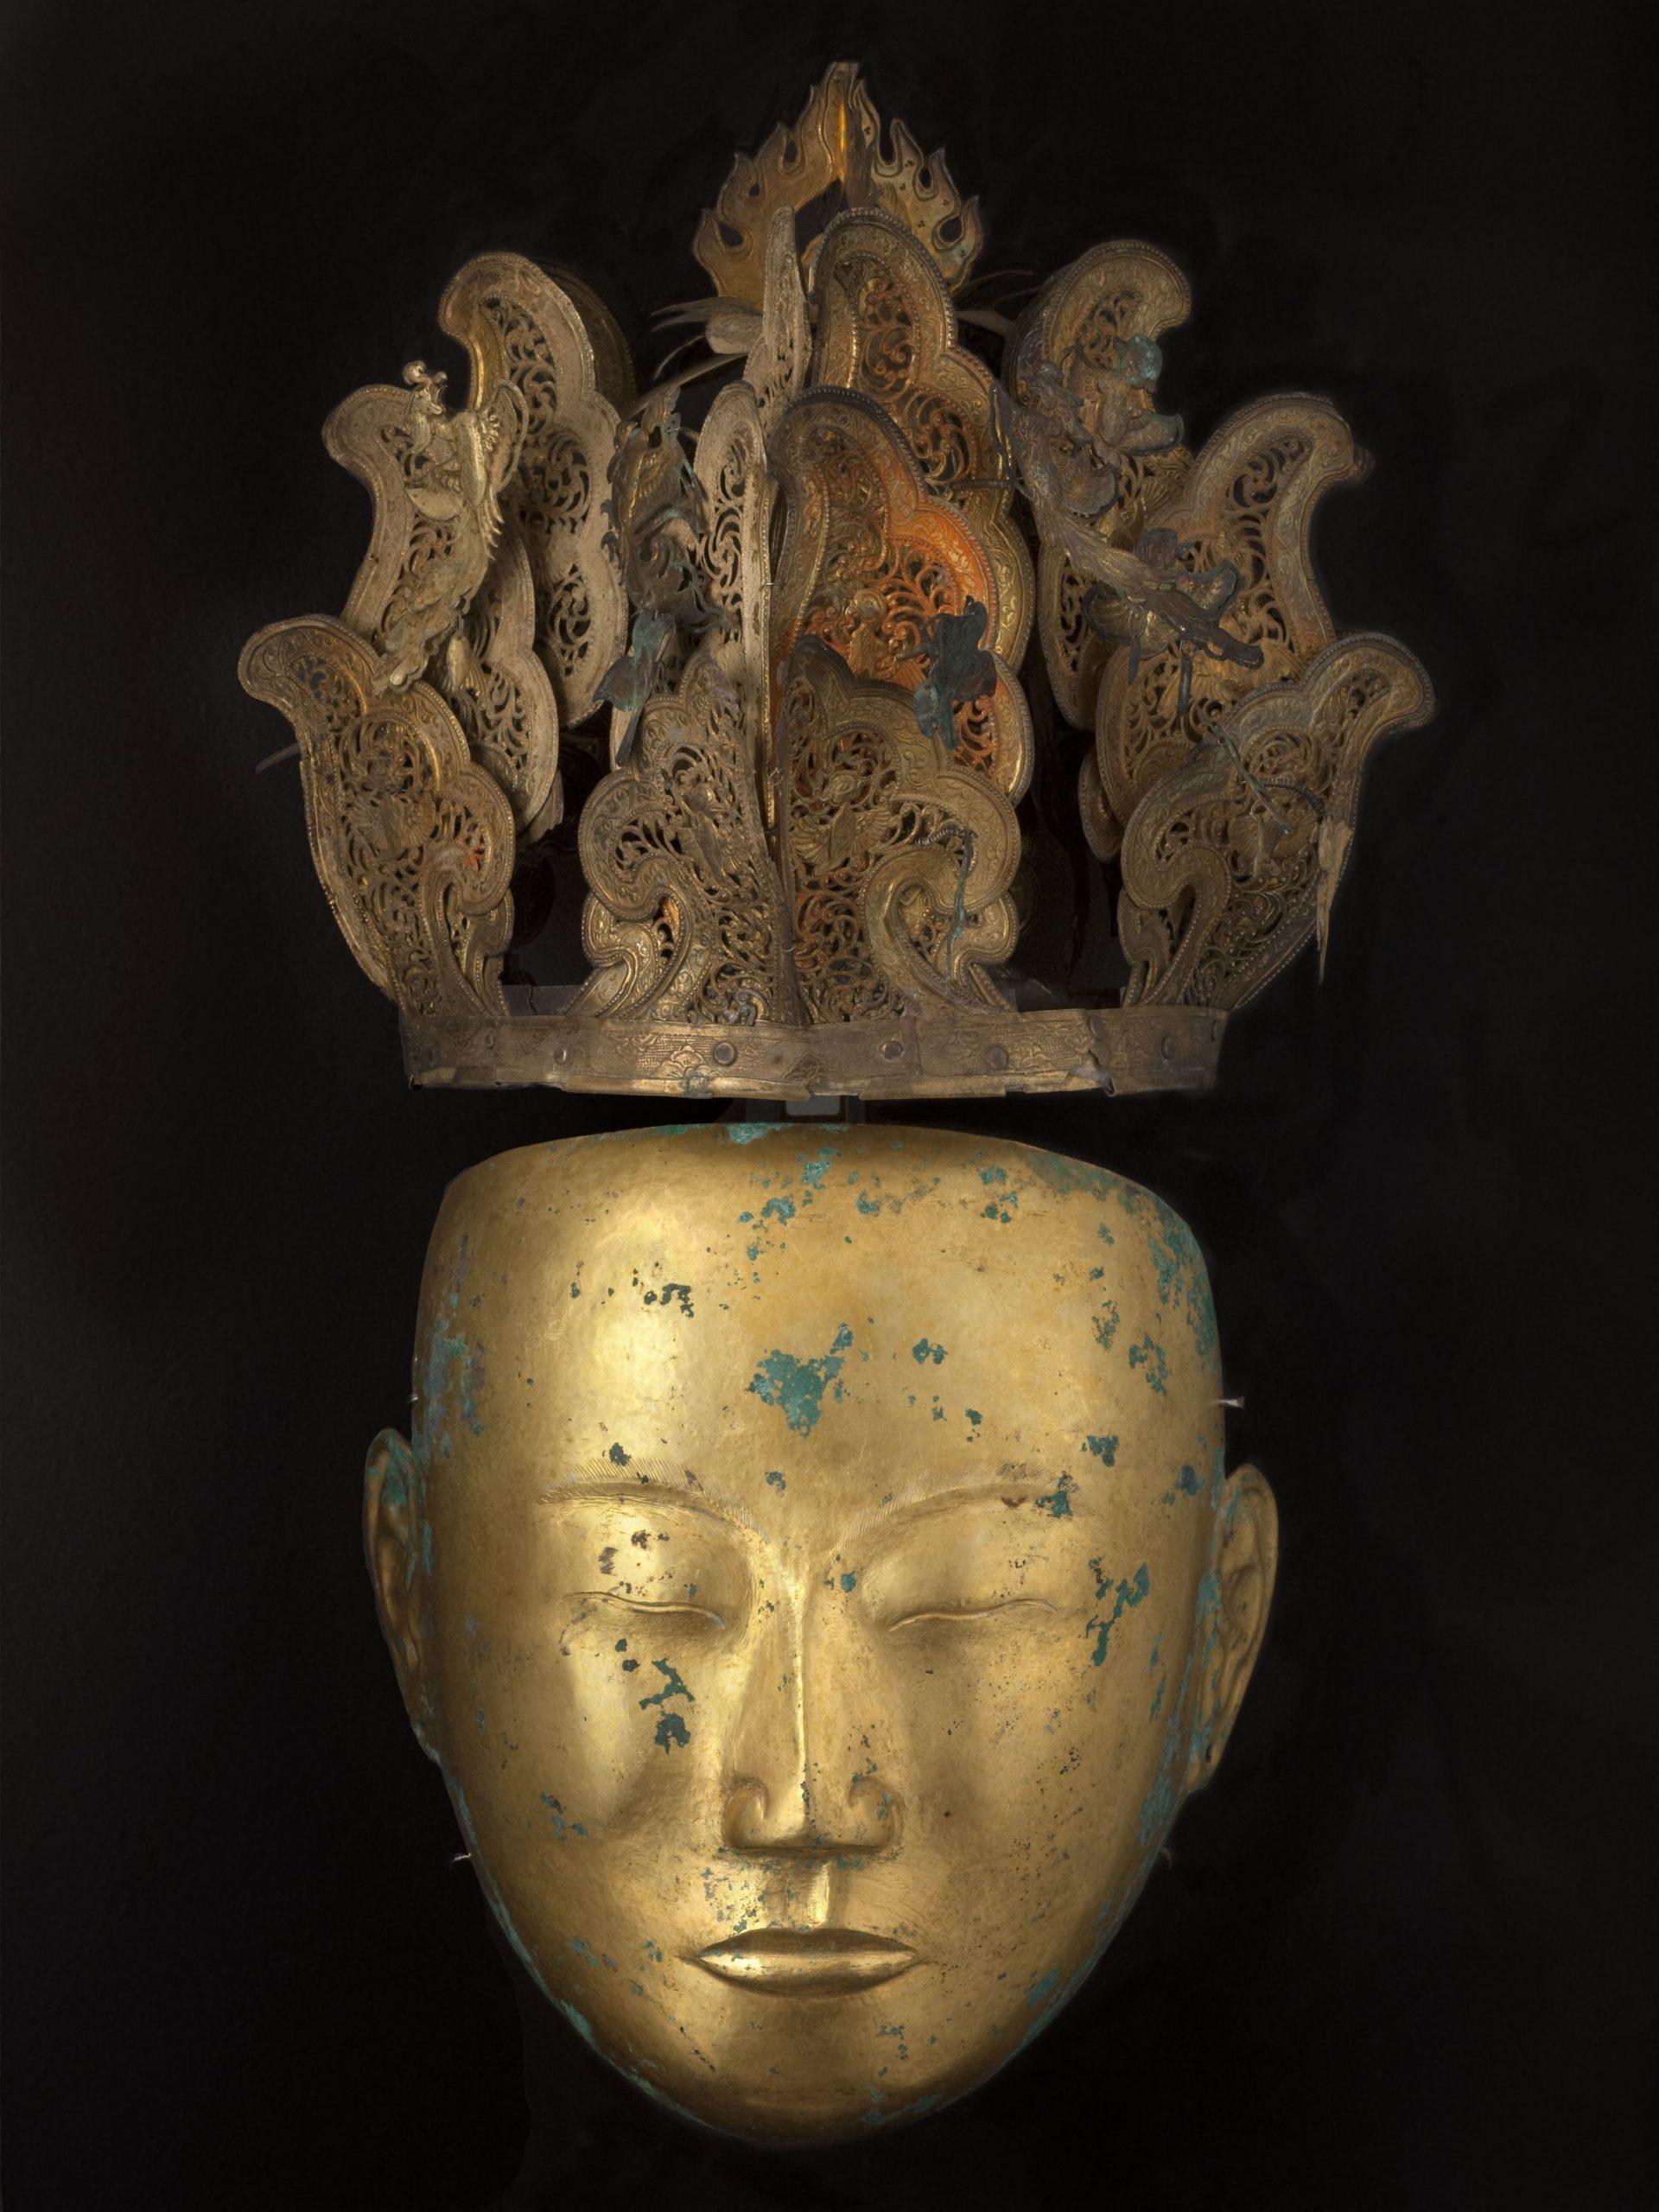 Masque funéraire, bronze, dorure, dynastie des Liao